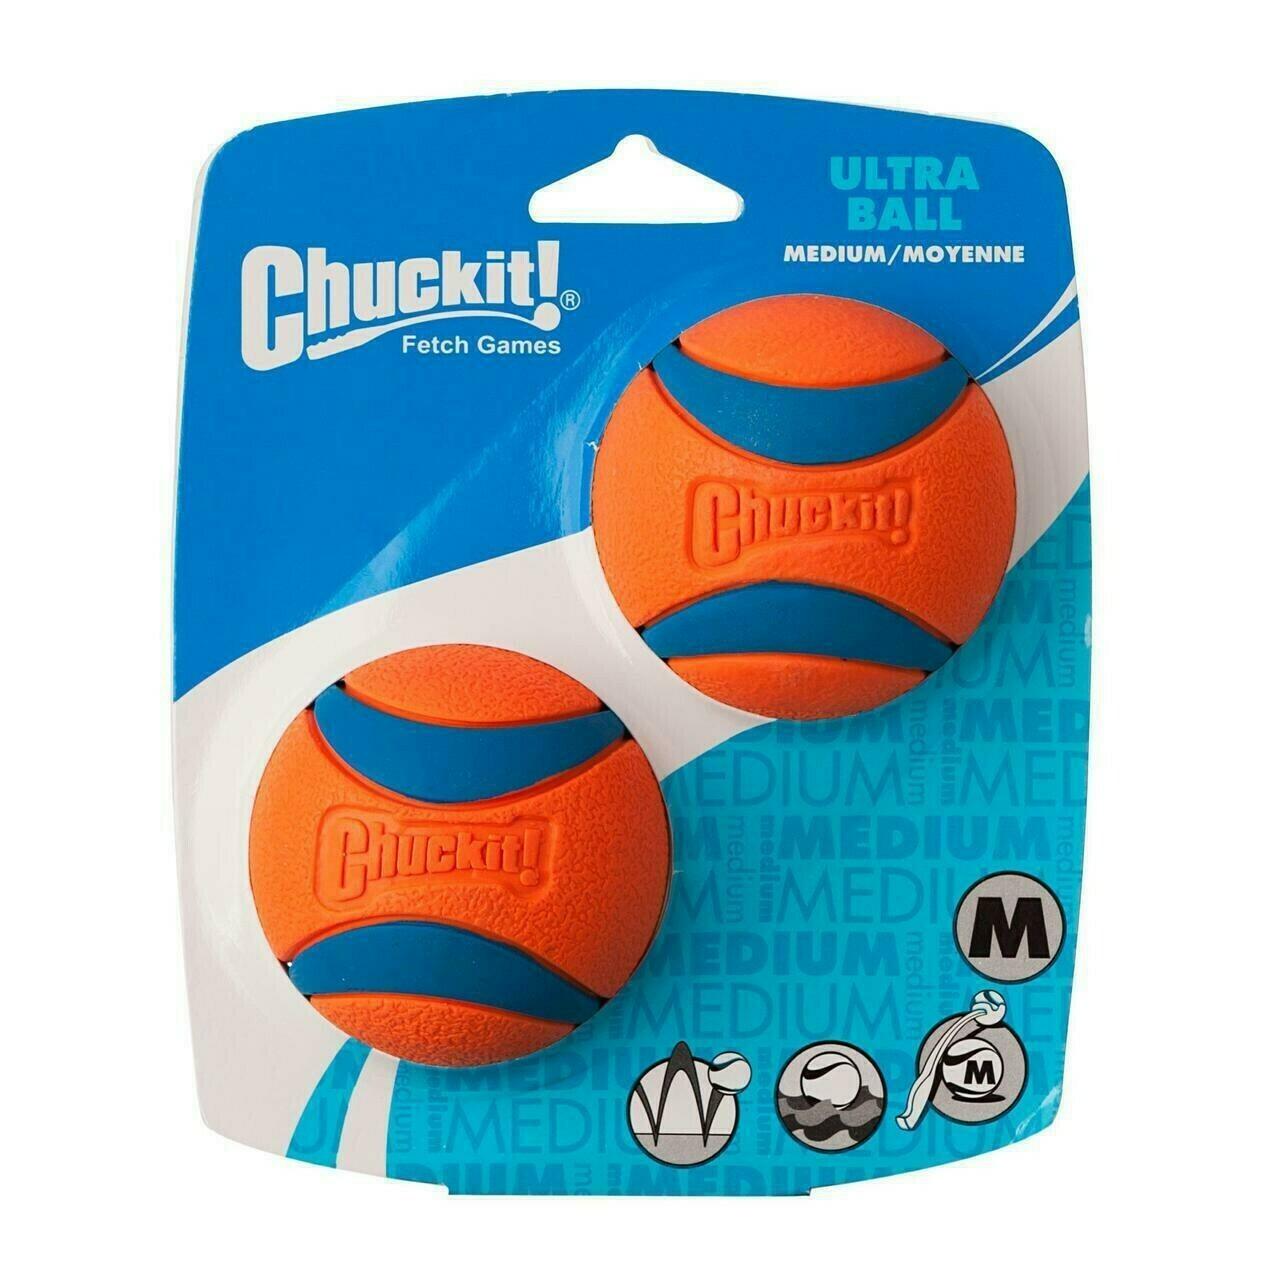 Chuckit! Ultra 2pk balls Medium